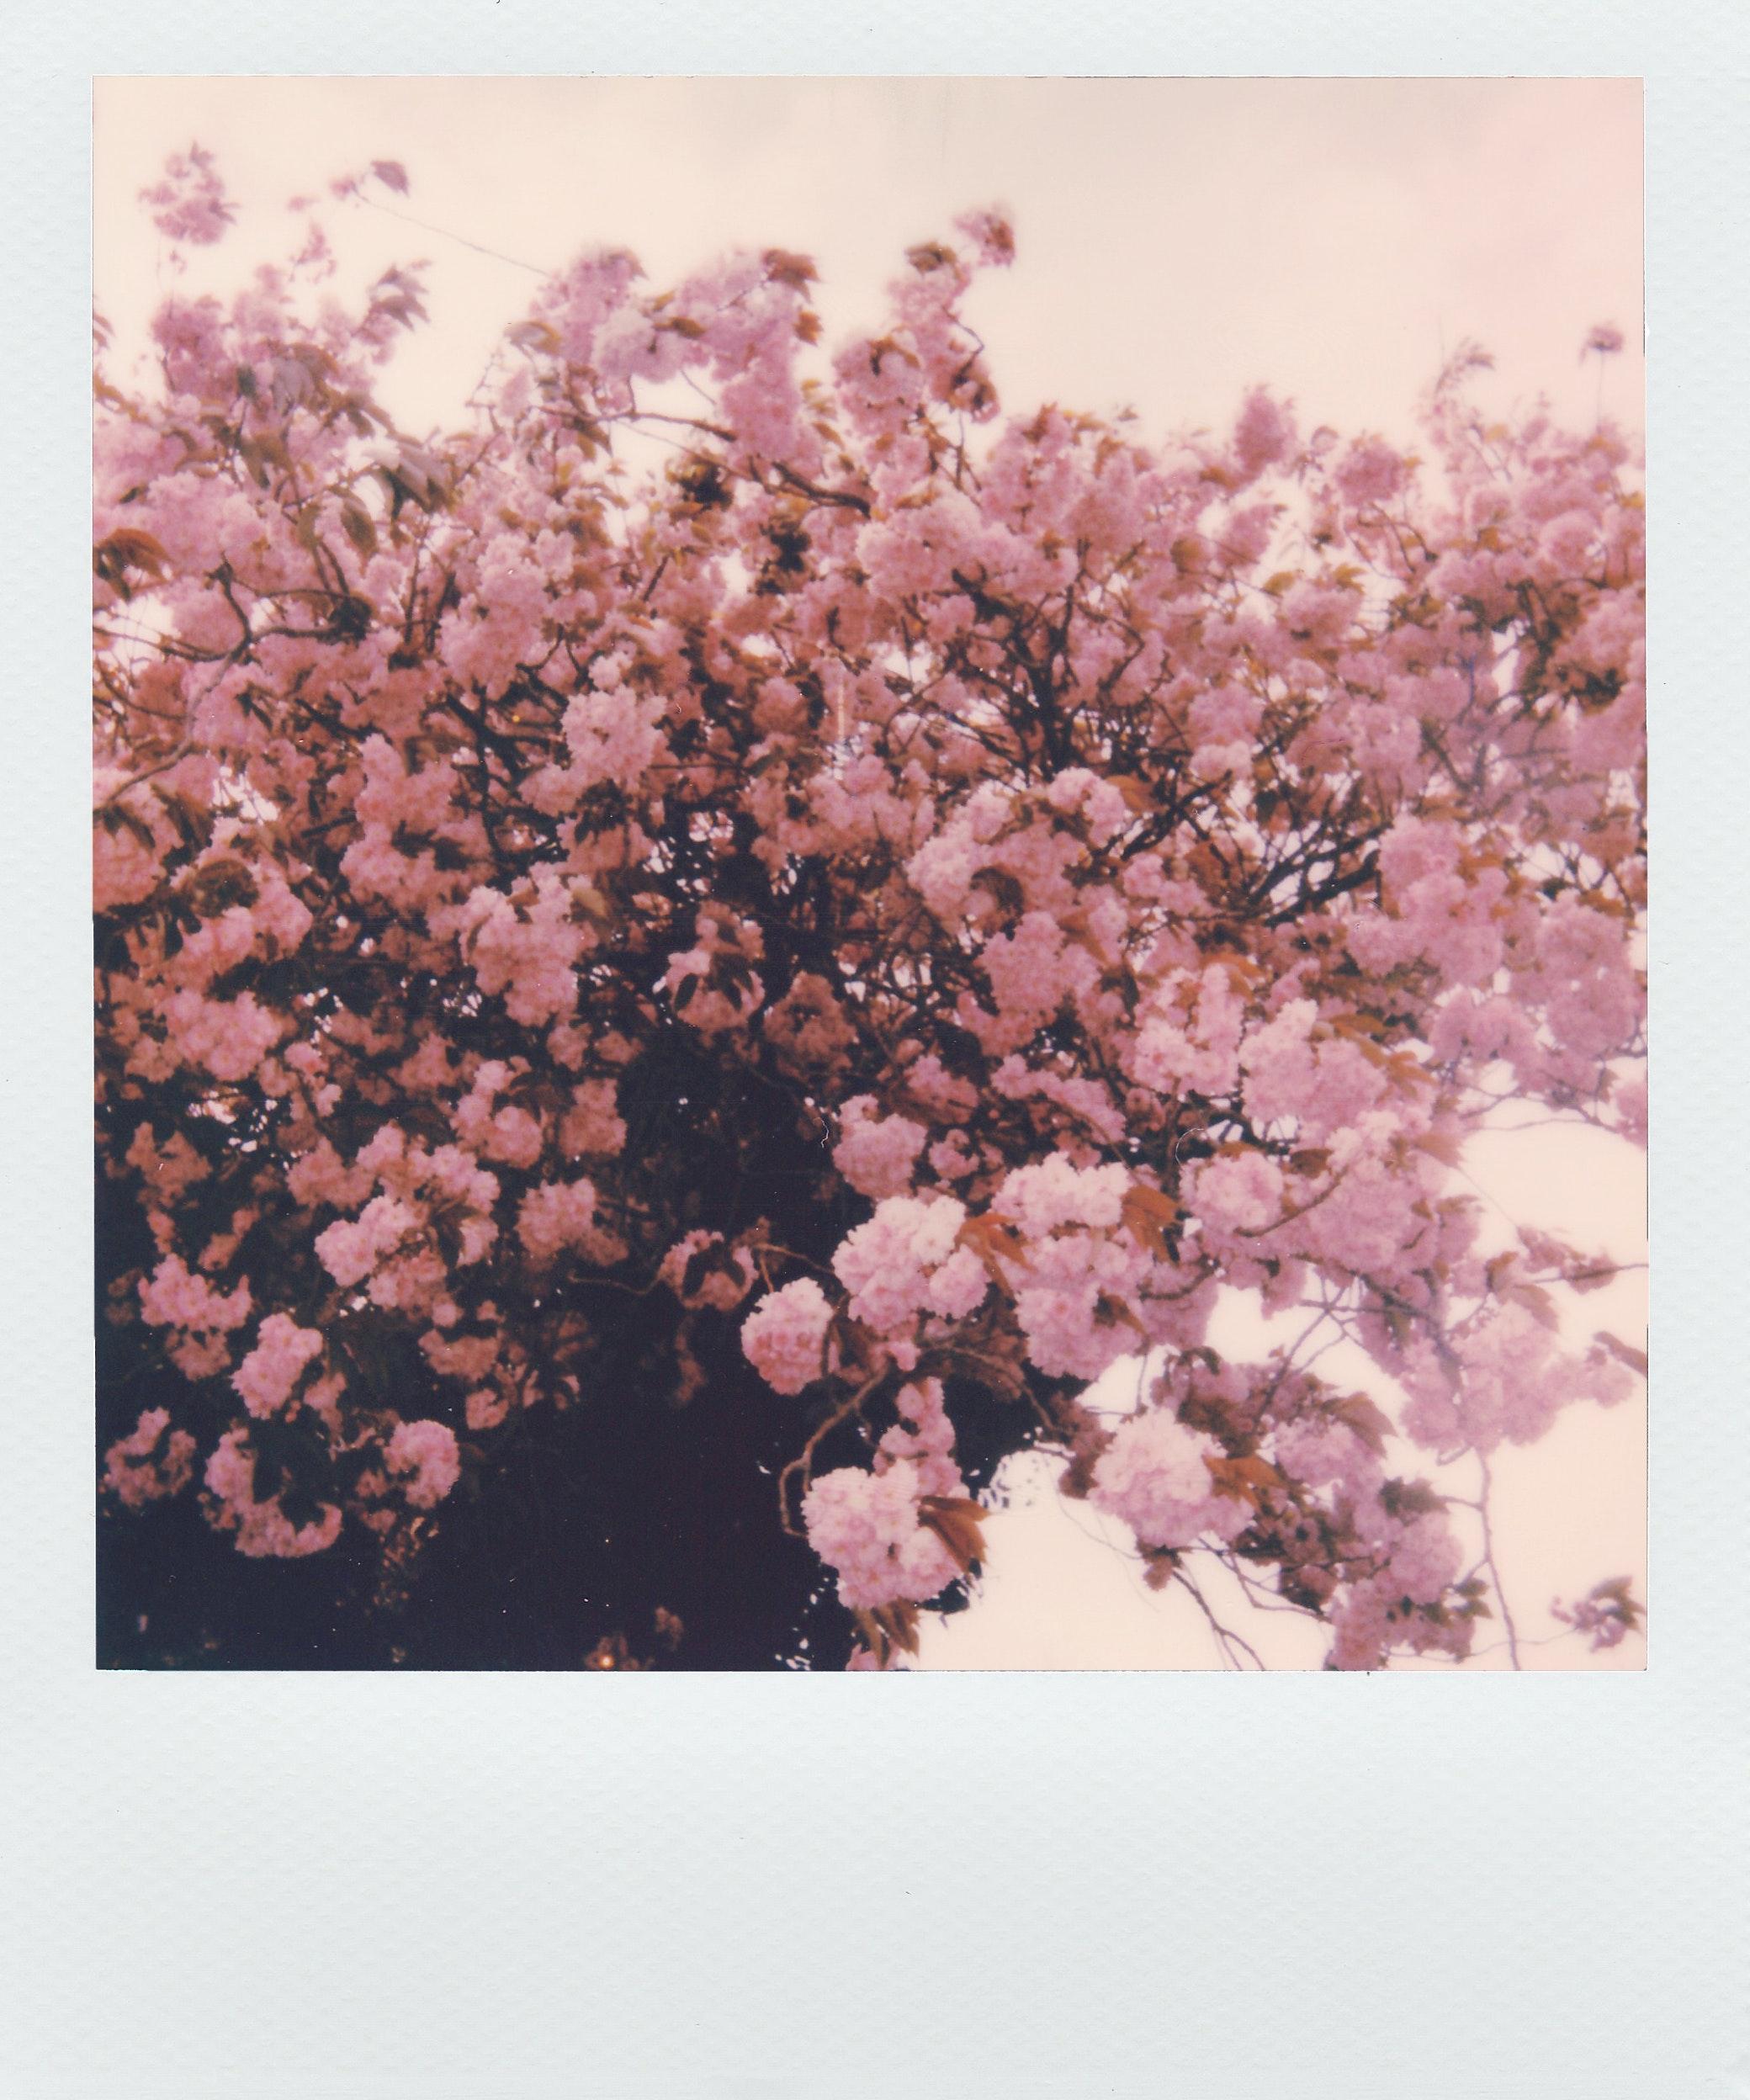 beautiful-beautiful-flowers-blooming-2171129.jpg